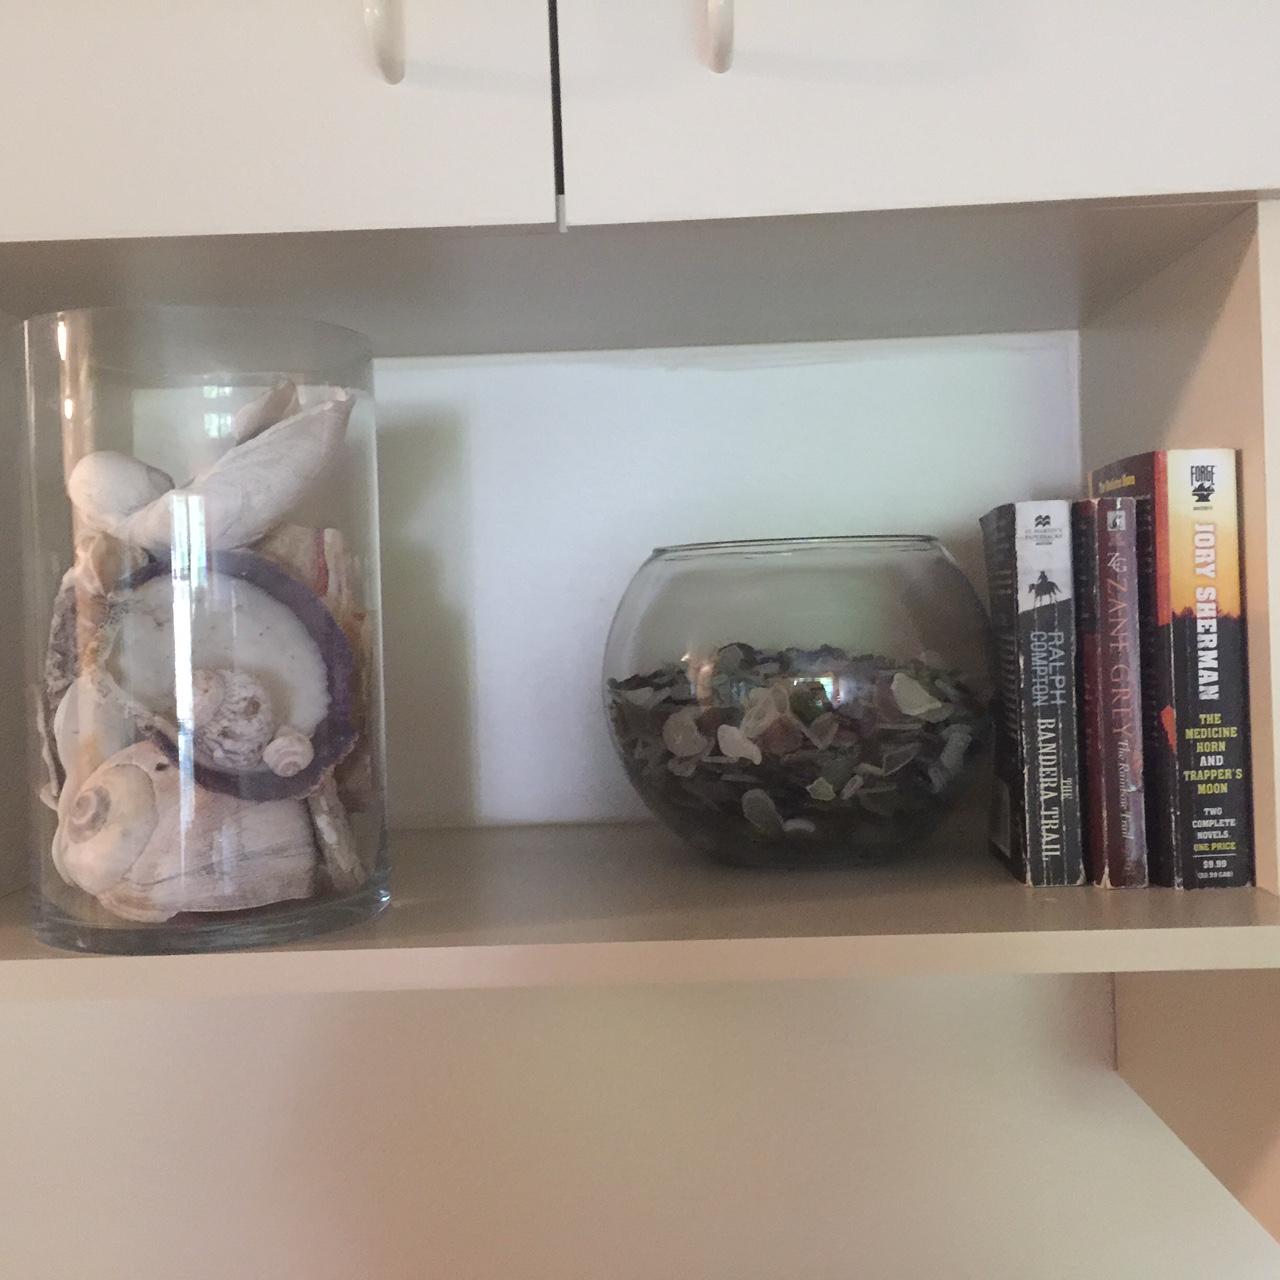 Seashells glass and books .JPG